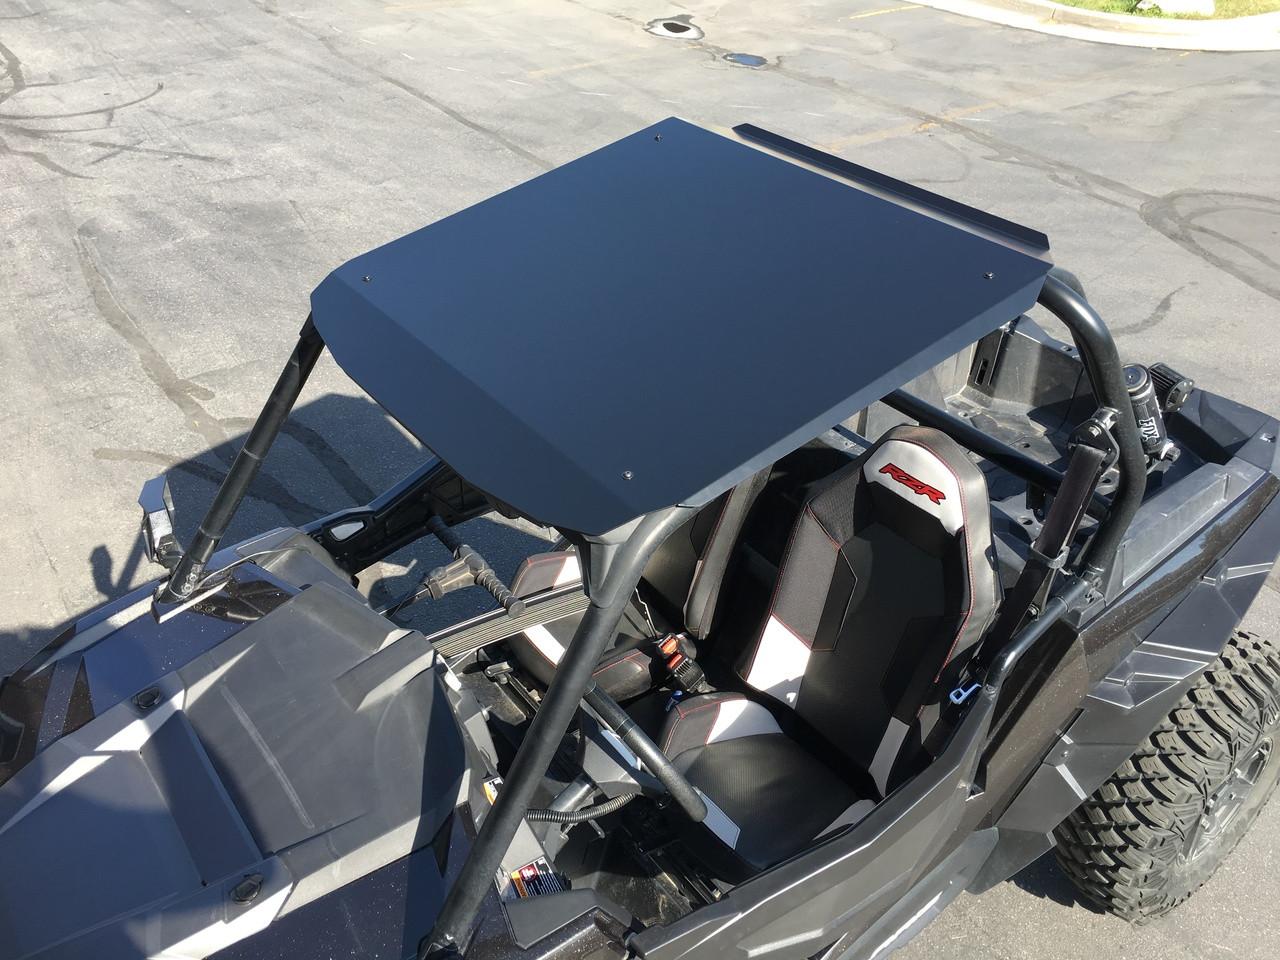 KUAFU Aluminum Roof Fit for Polaris RZR 900 900S 1000S XP1000 Turbo 2015-2019 2 Door Model Low Profile Black Powder Coat